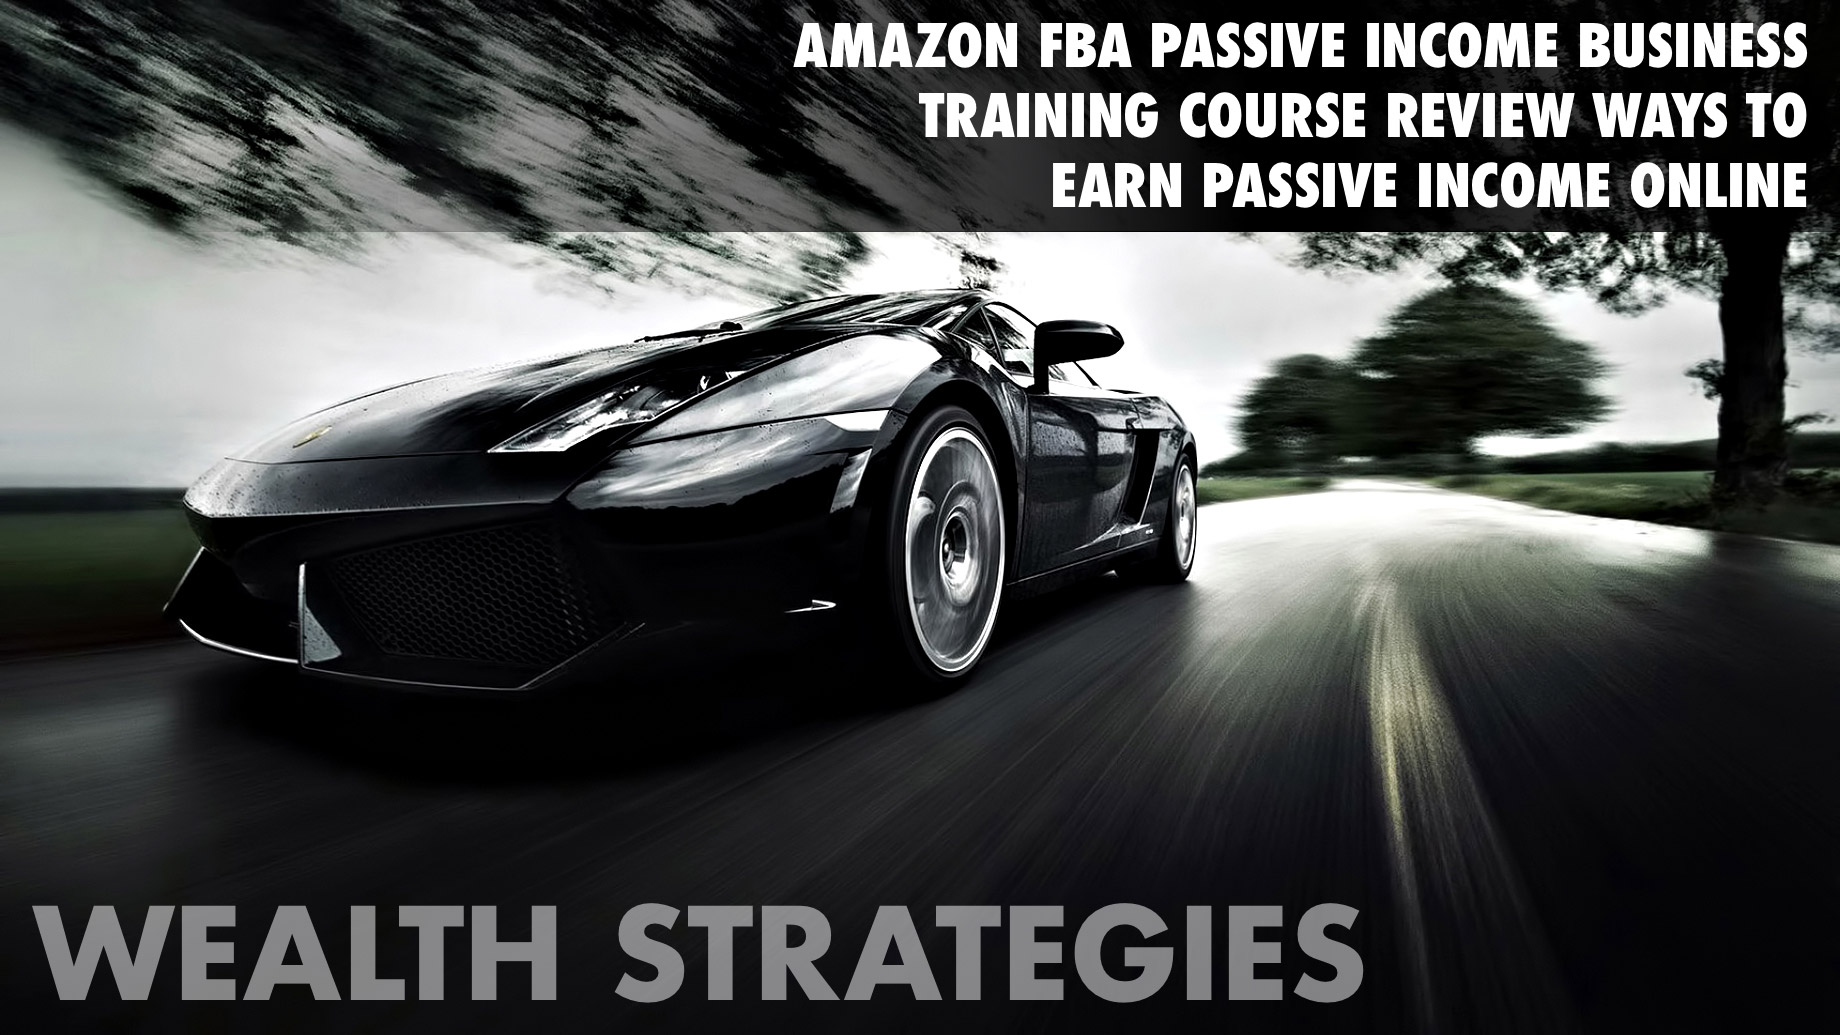 Wealth Strategies - Amazon FBA Passive Income Business Training Course